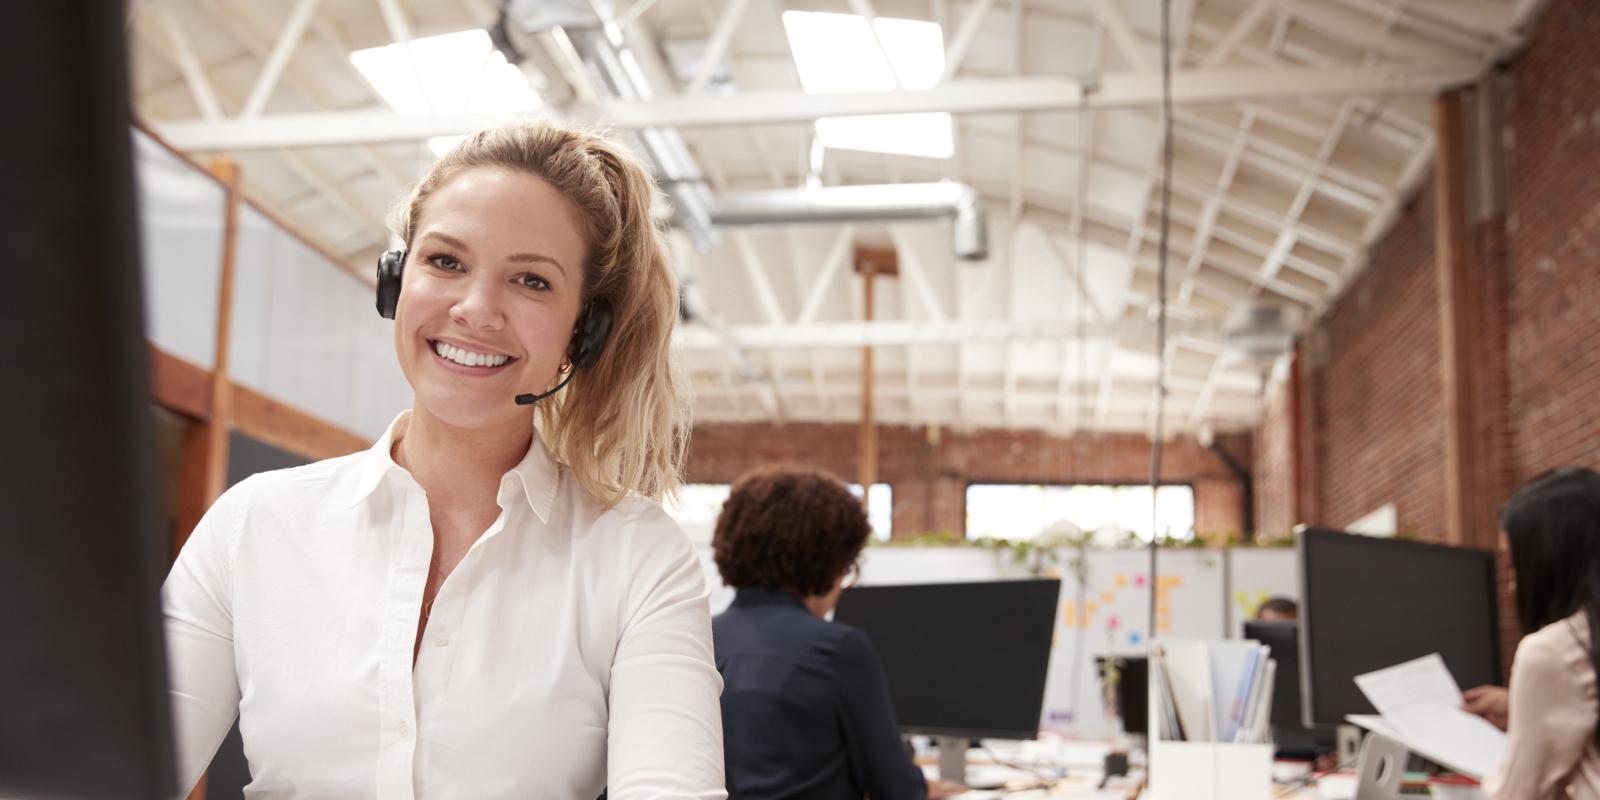 Managing customer communication